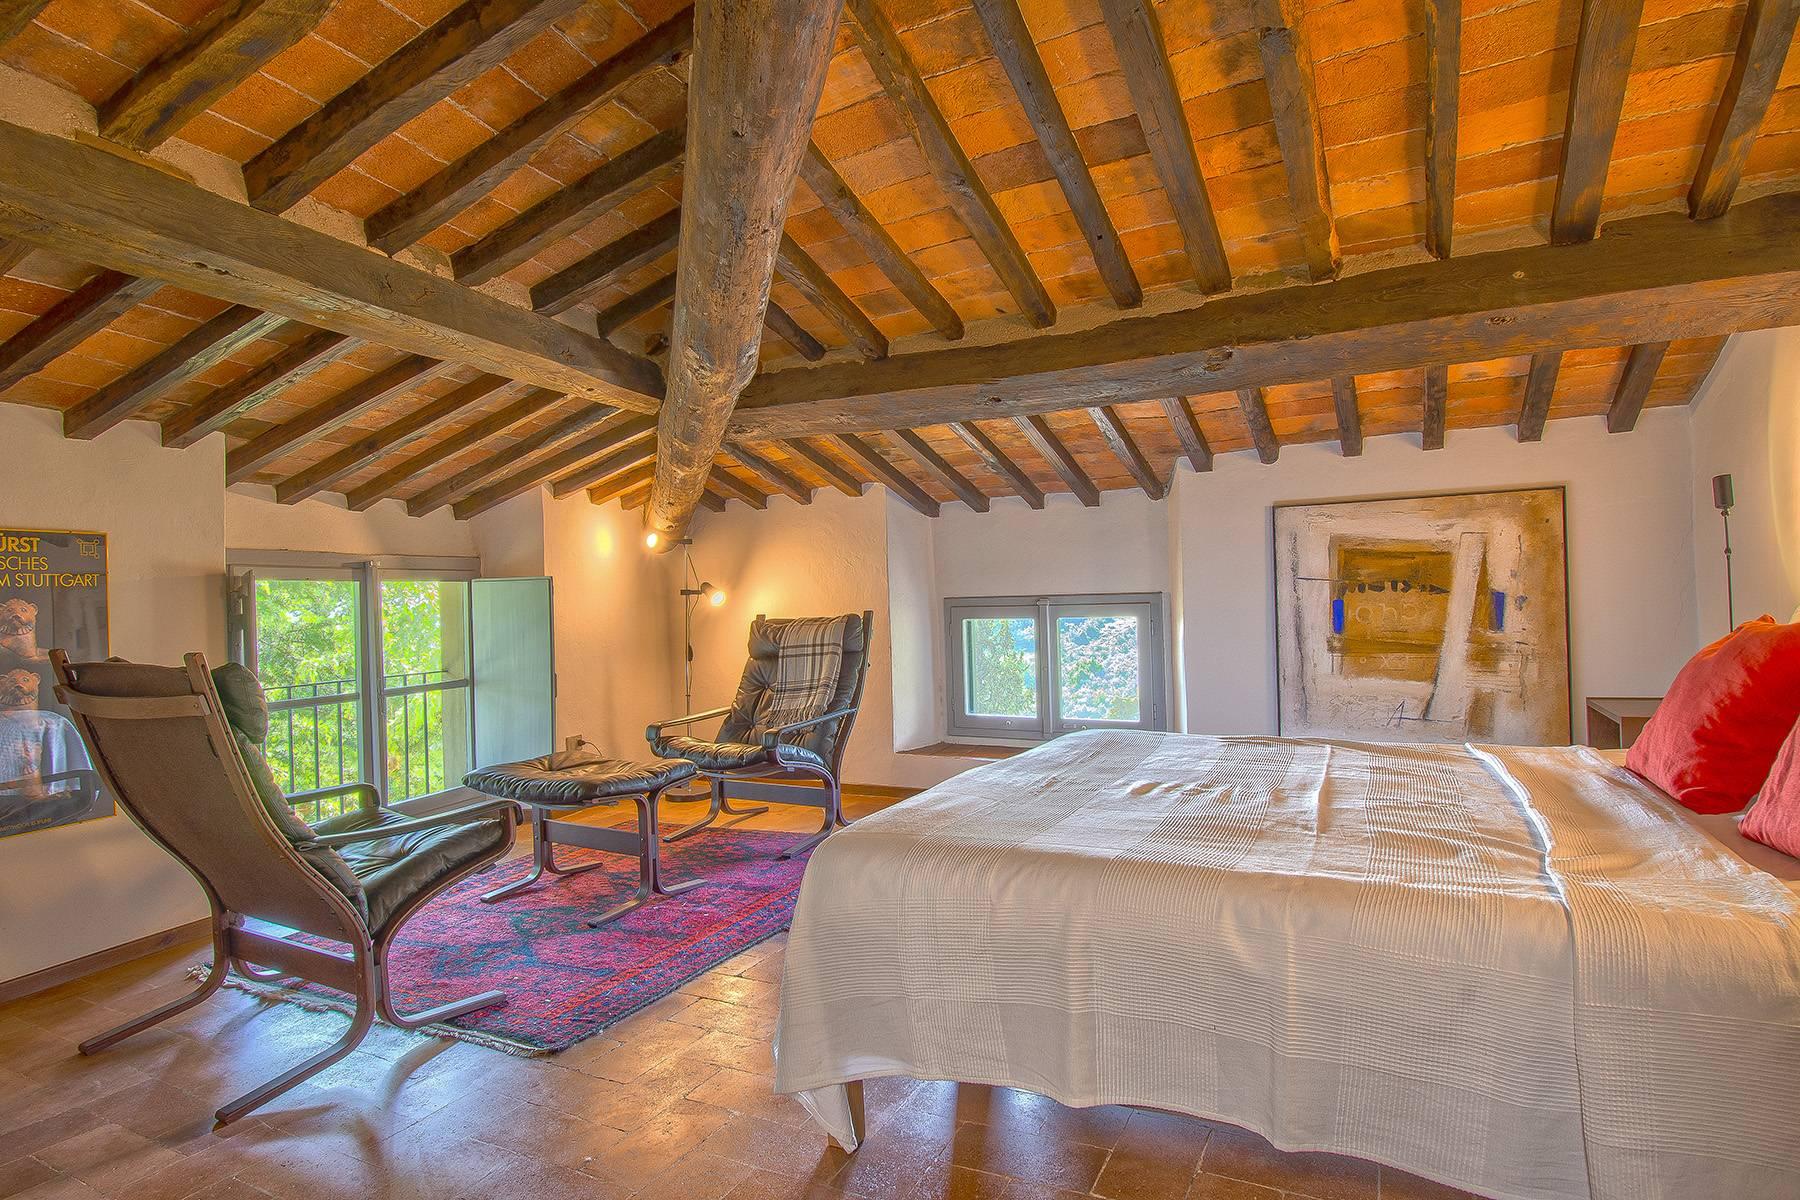 Villa in Vendita a Capannori: 5 locali, 380 mq - Foto 20